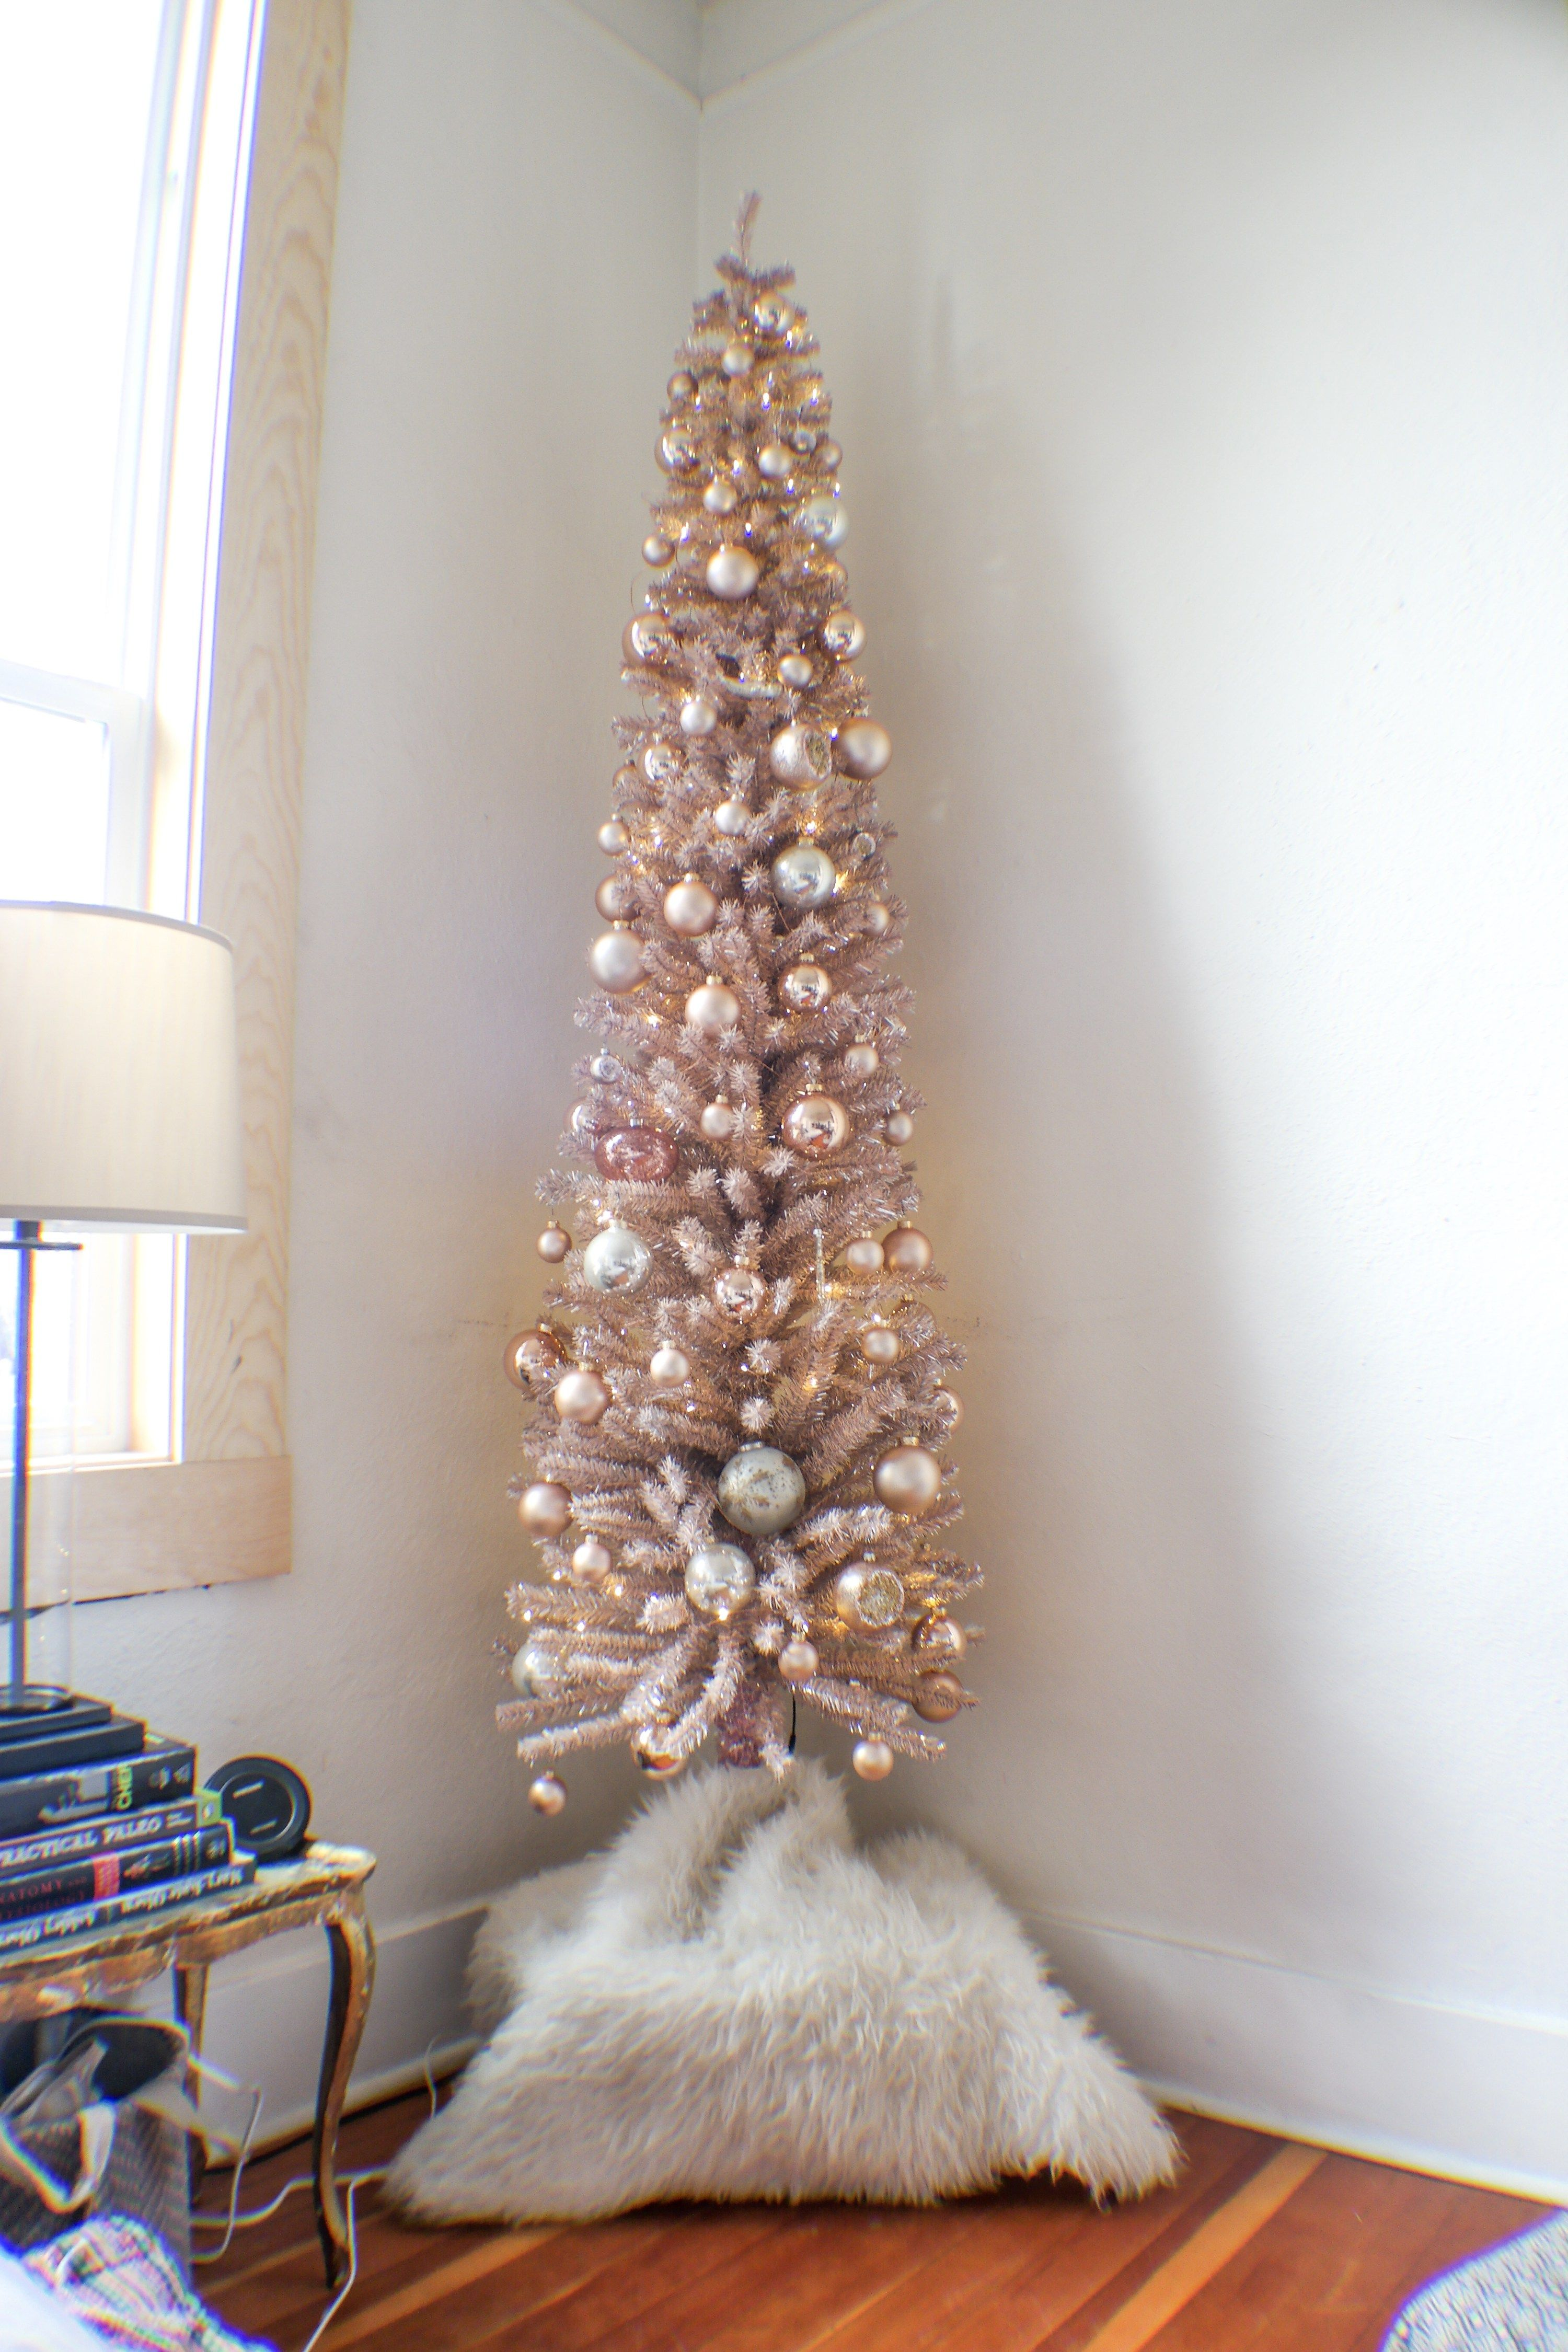 Rose Gold Christmas Tree Samantha Hauger Rose Gold Christmas Tree Rose Gold Christmas Decorations Tinsel Christmas Tree